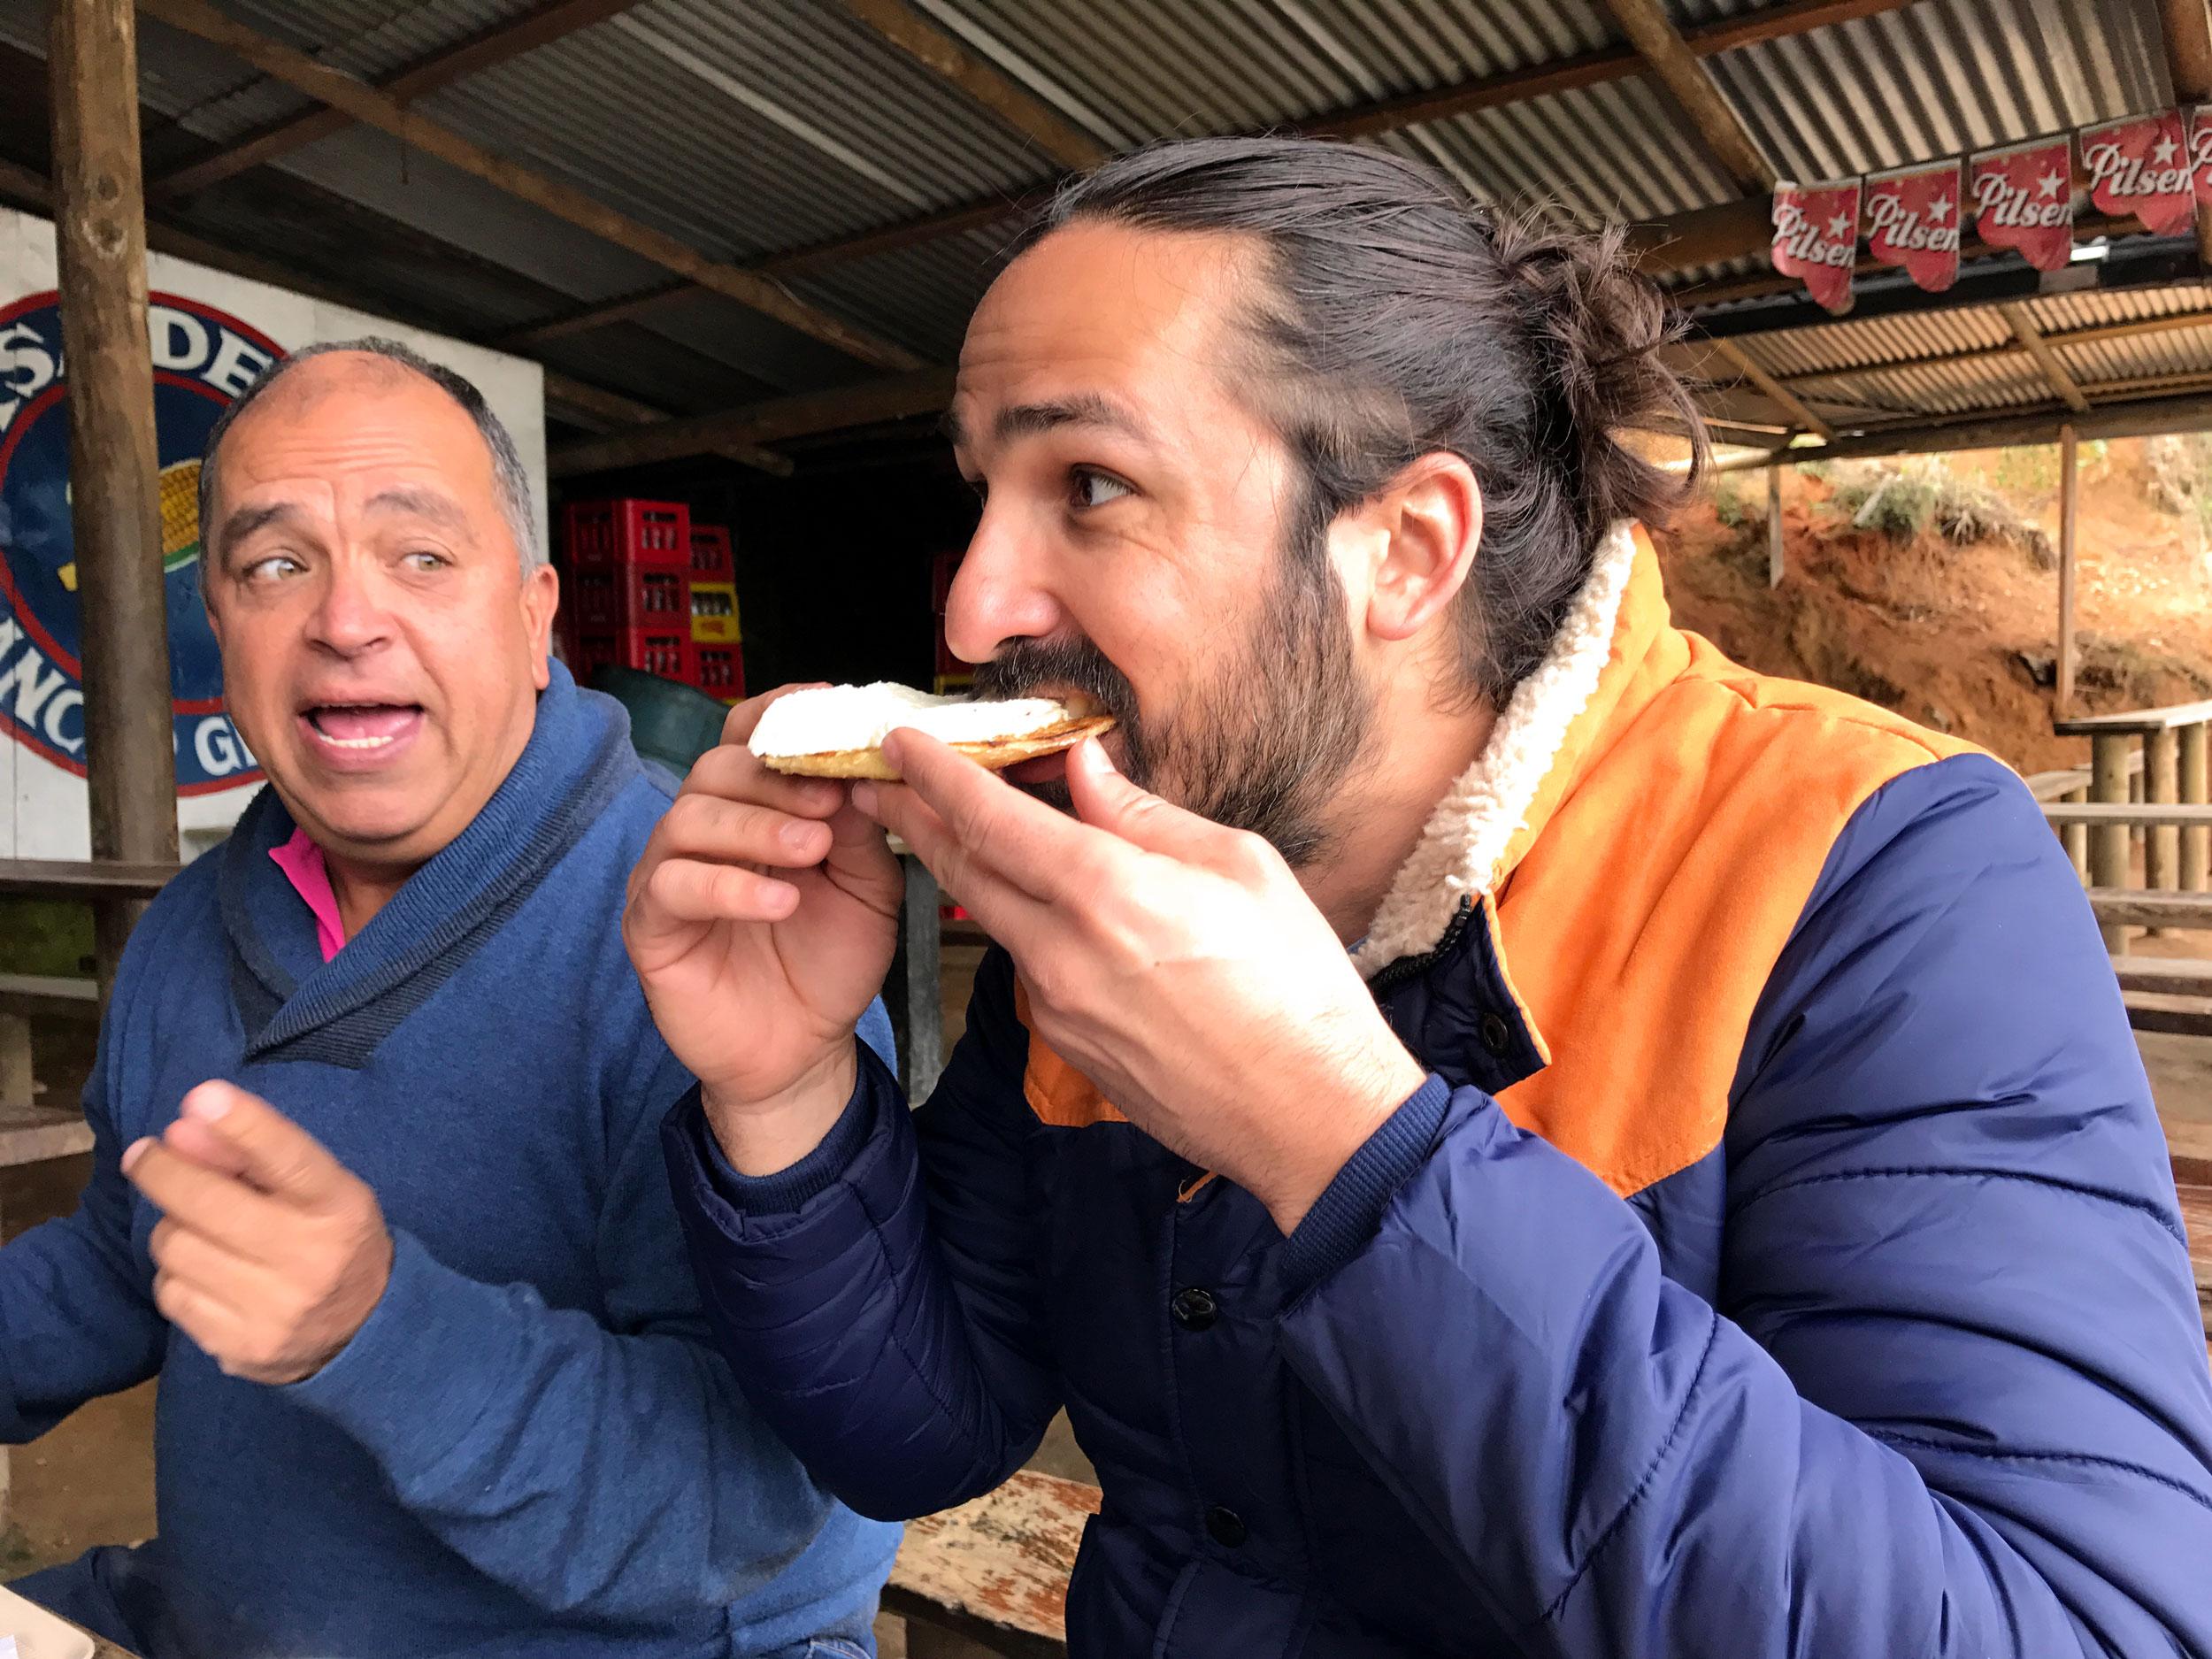 Diego and Juan eating arepas